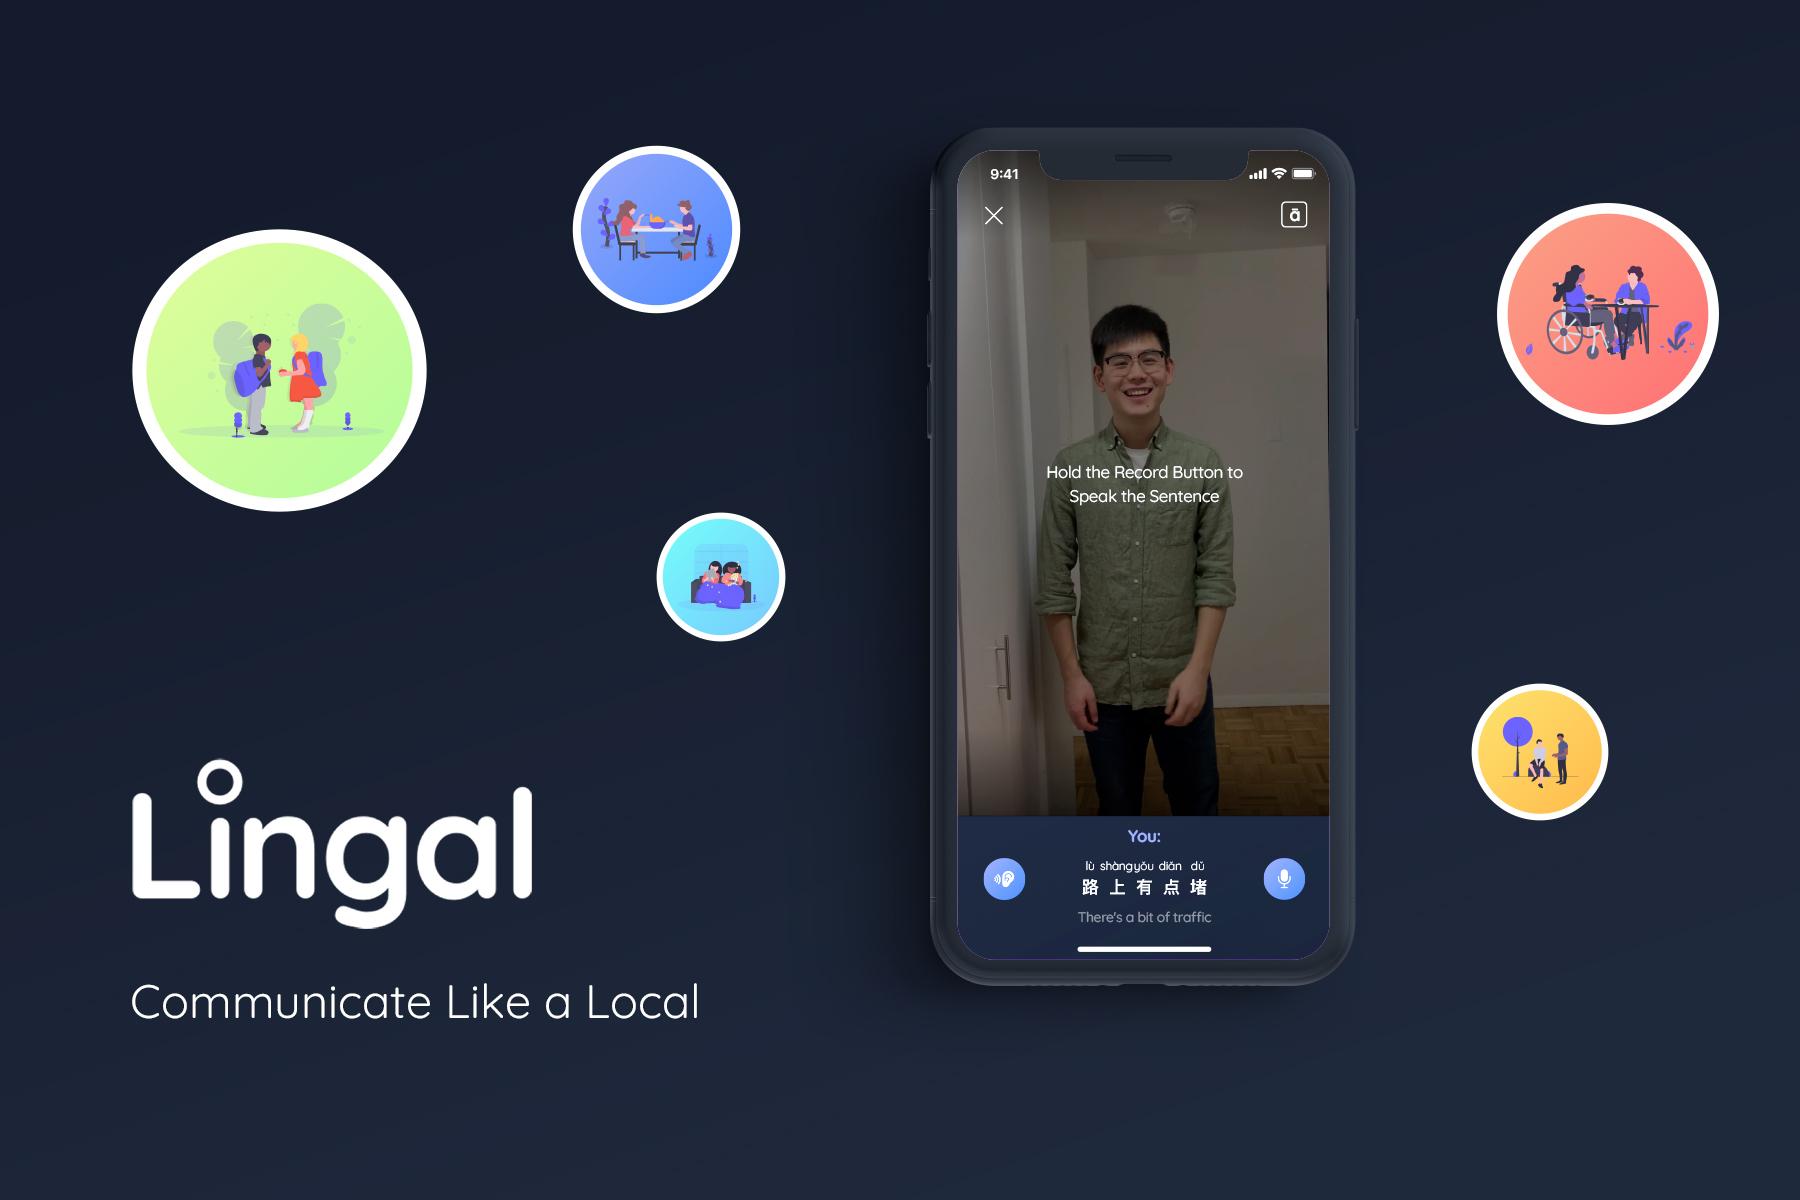 Lingal A Mandarin language learning platform that teaches pronunciation and conversation visually.